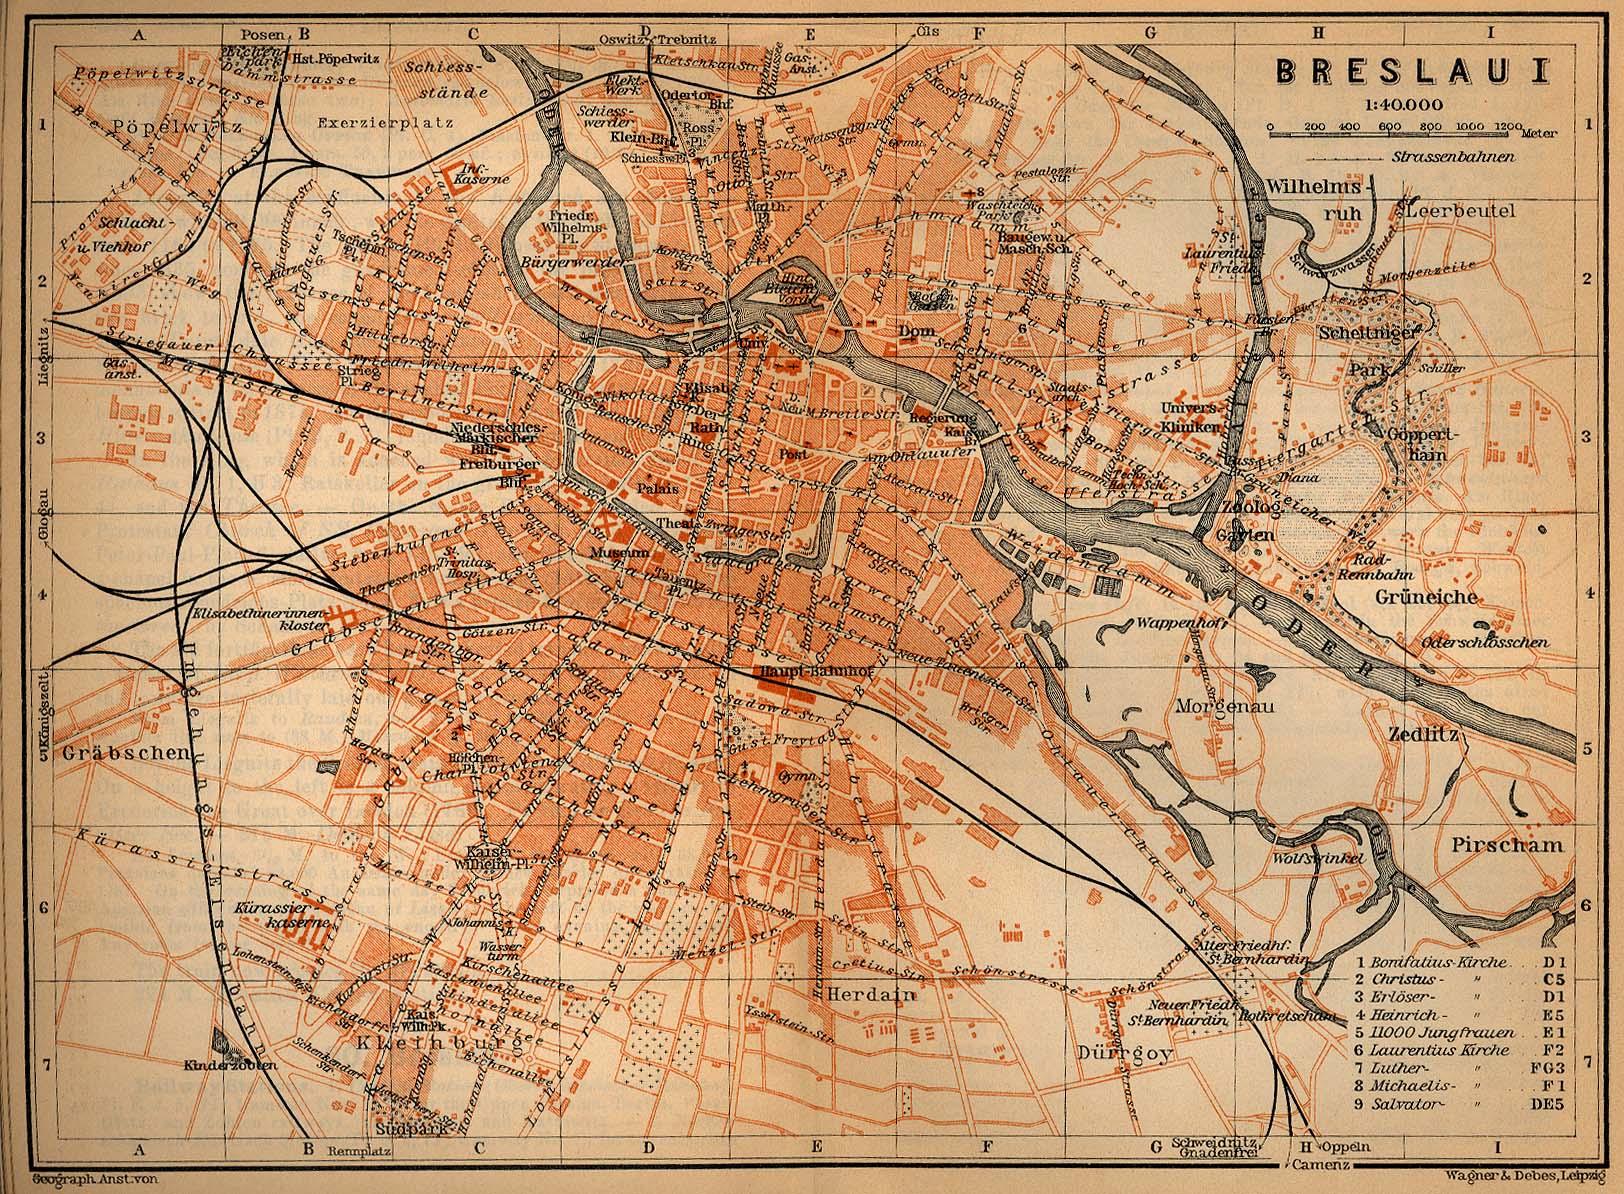 Mapa de Breslavia (Bresláu), Polonia 1910